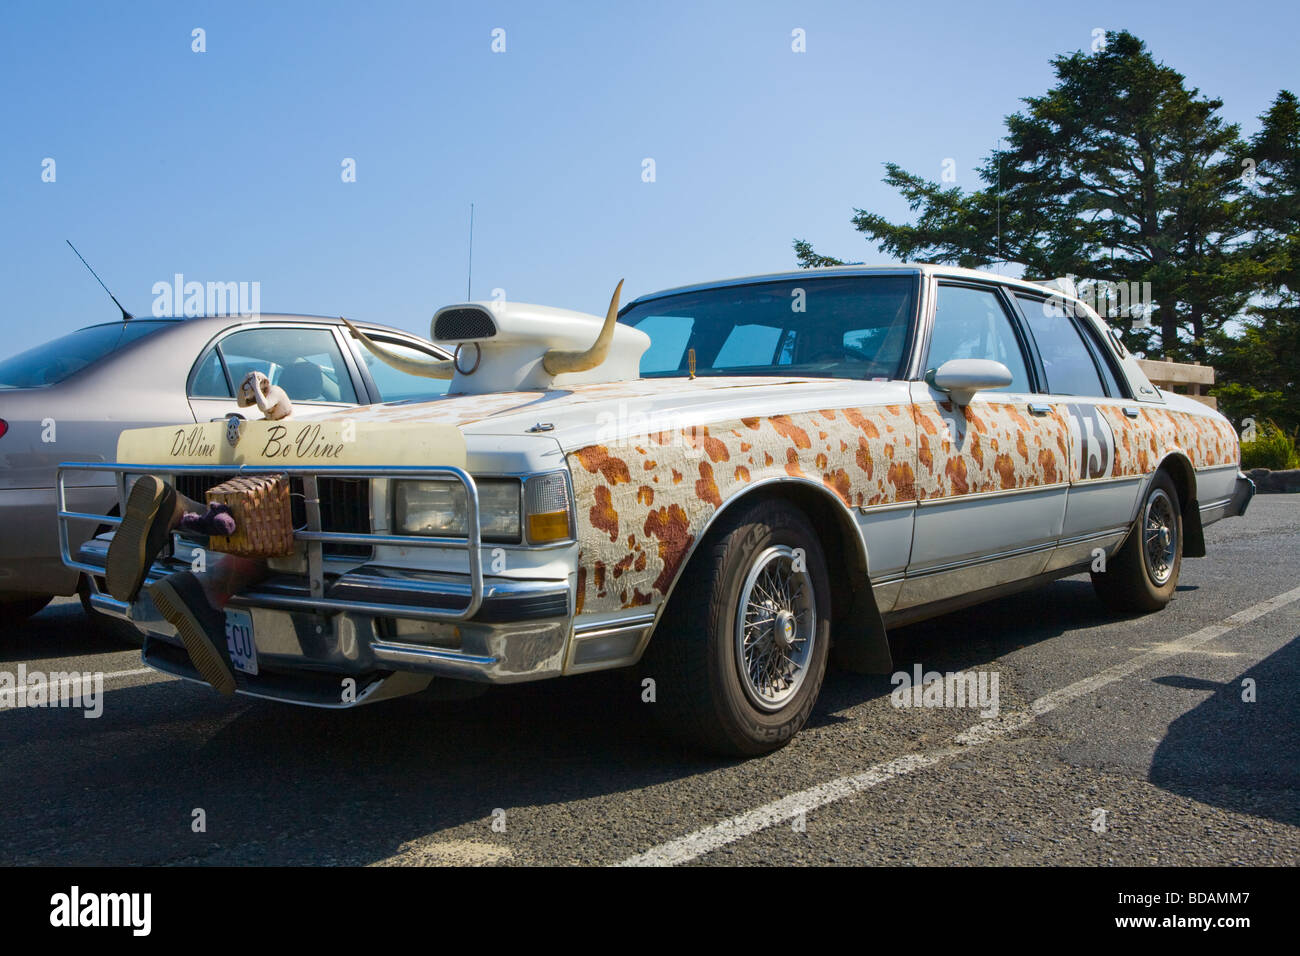 Bovine themed art car from Oregon seen at Yaquina Bay - Stock Image